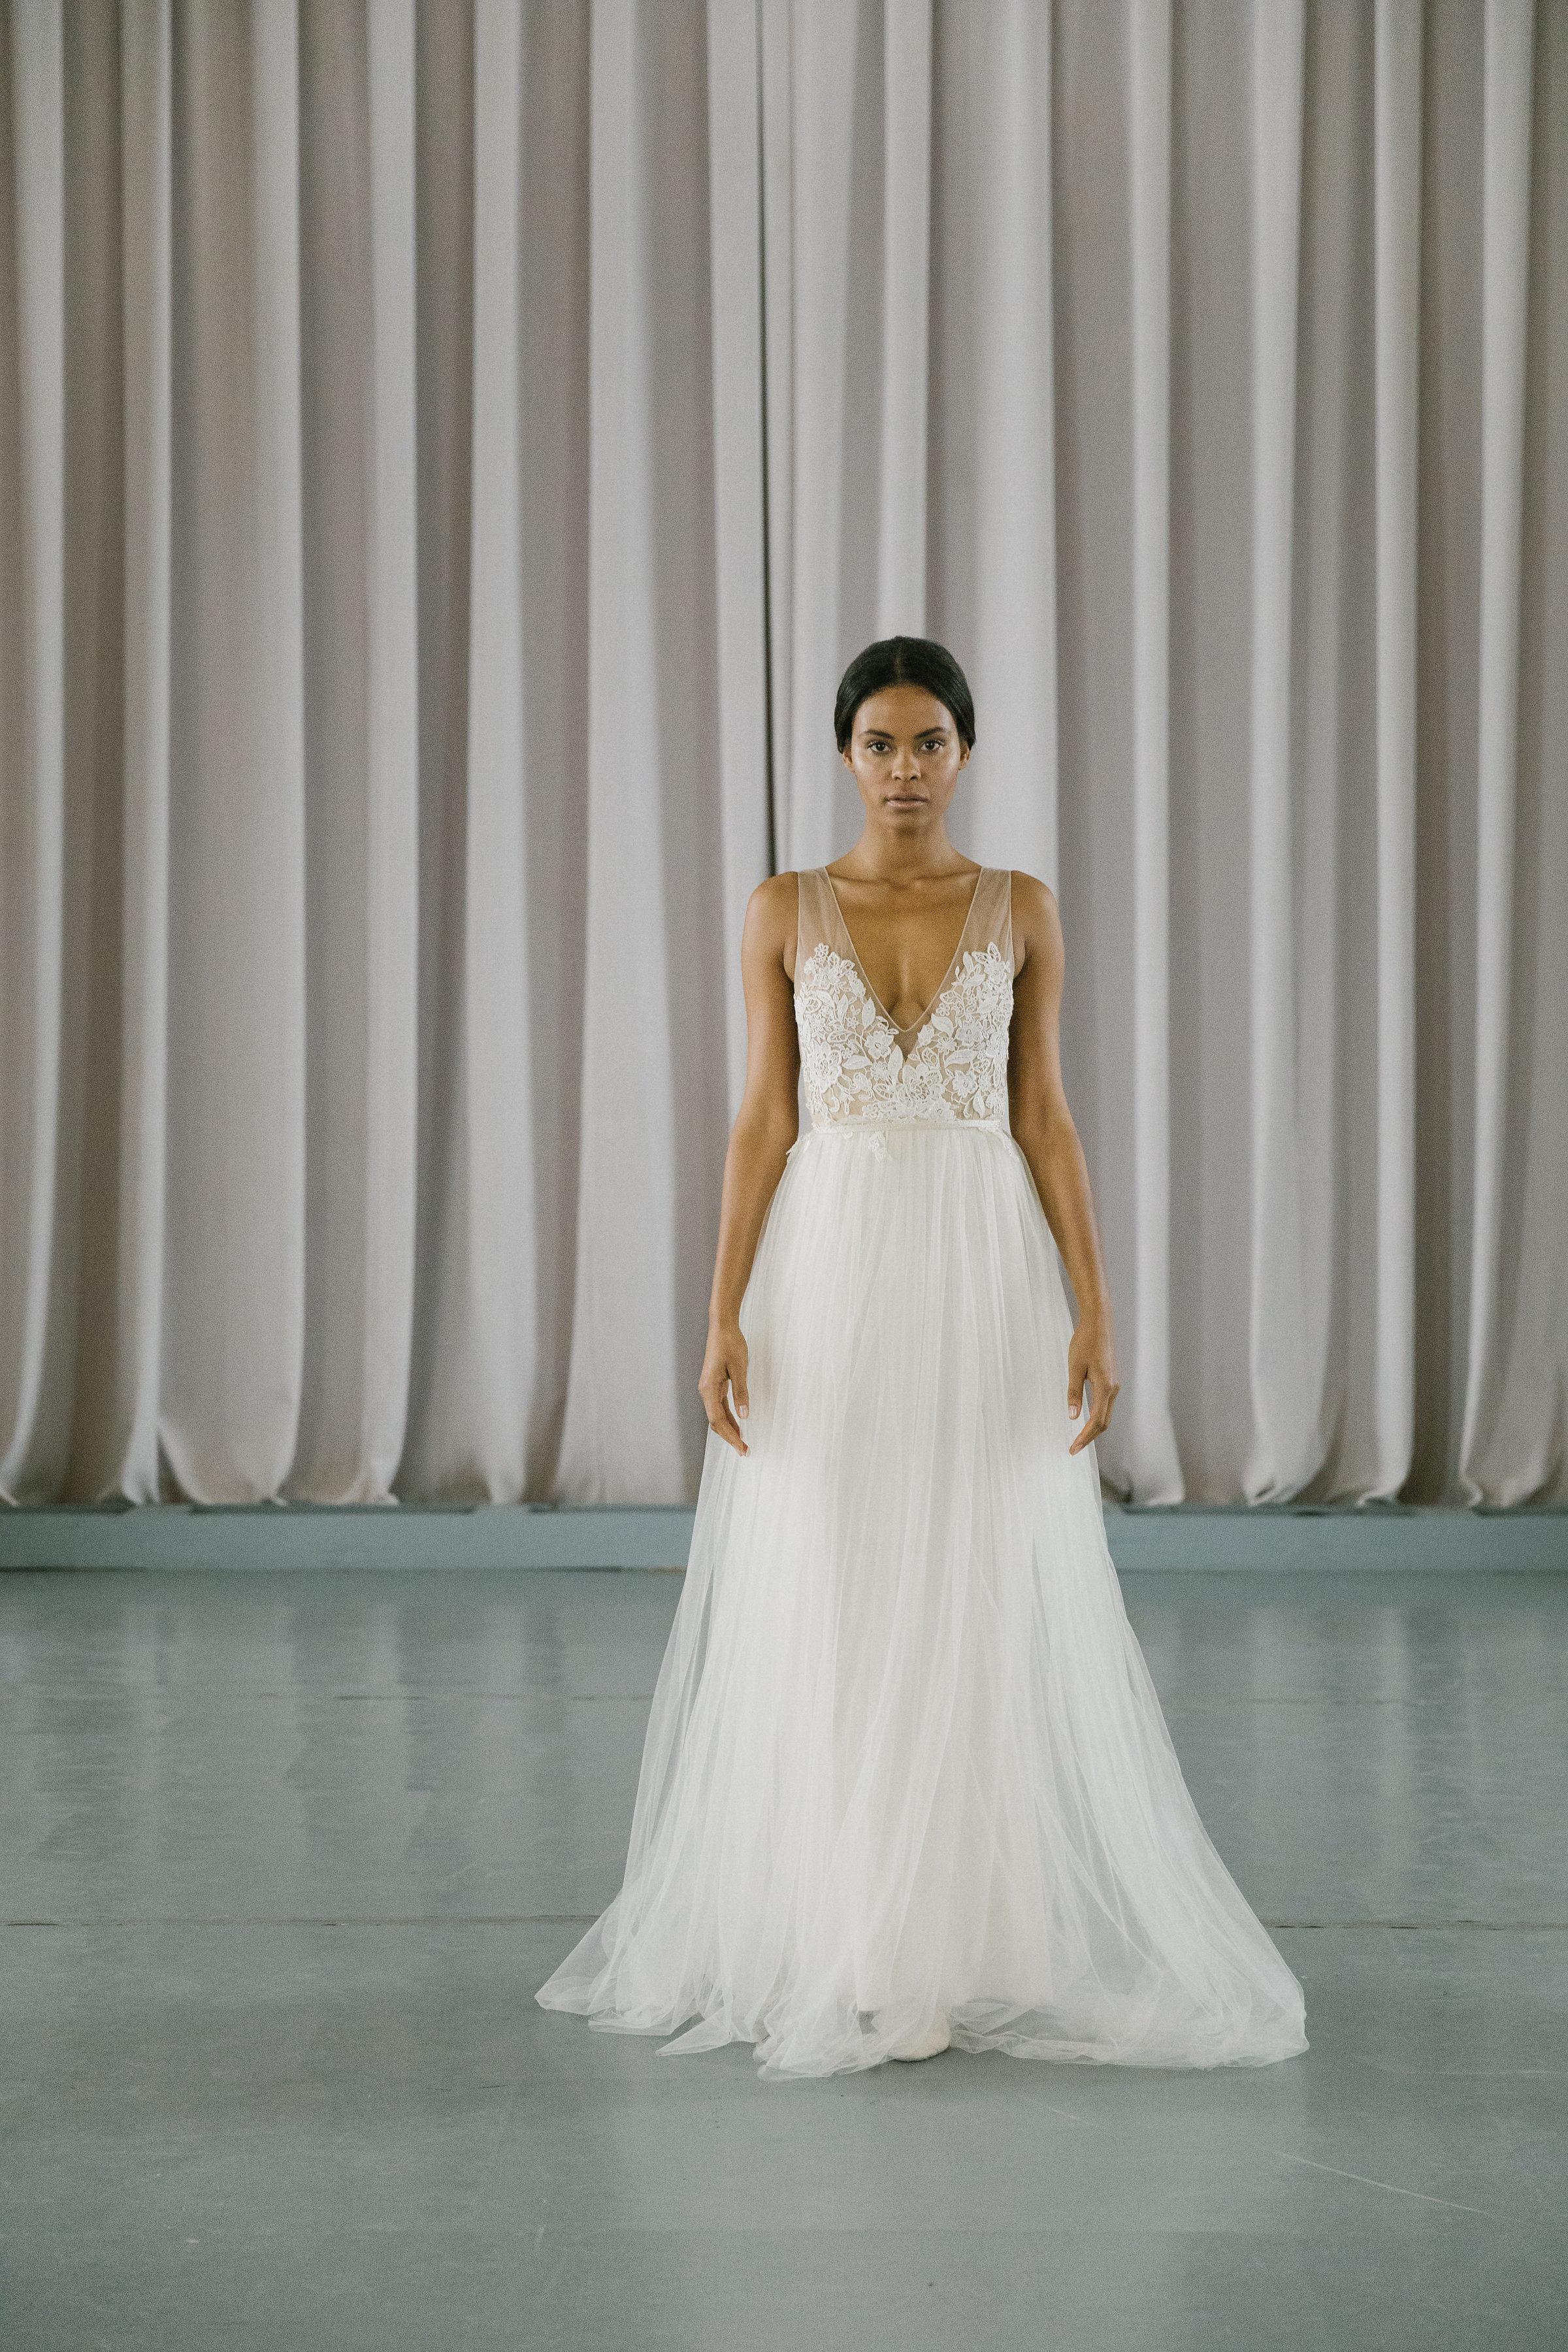 04 May Alexandra Grecco Gilded Bridal Wedding Dress North Carolina